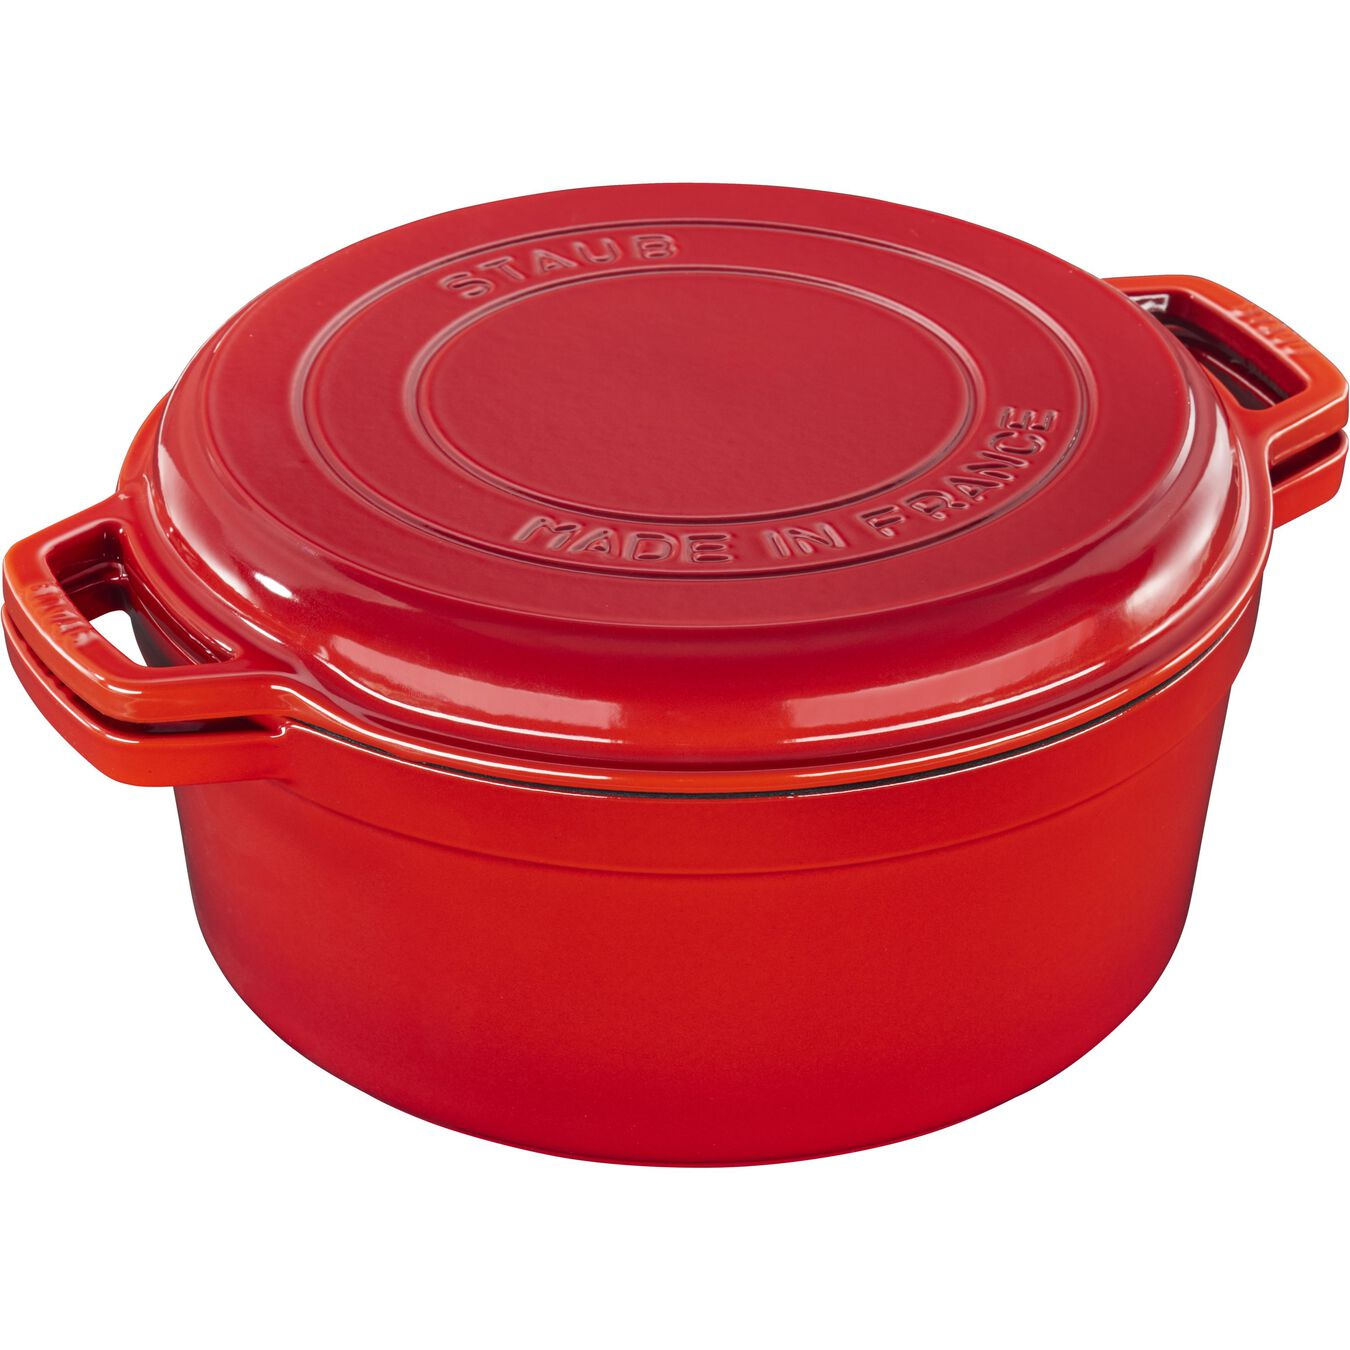 6 l Cast iron round Braise + Grill, Cherry,,large 5